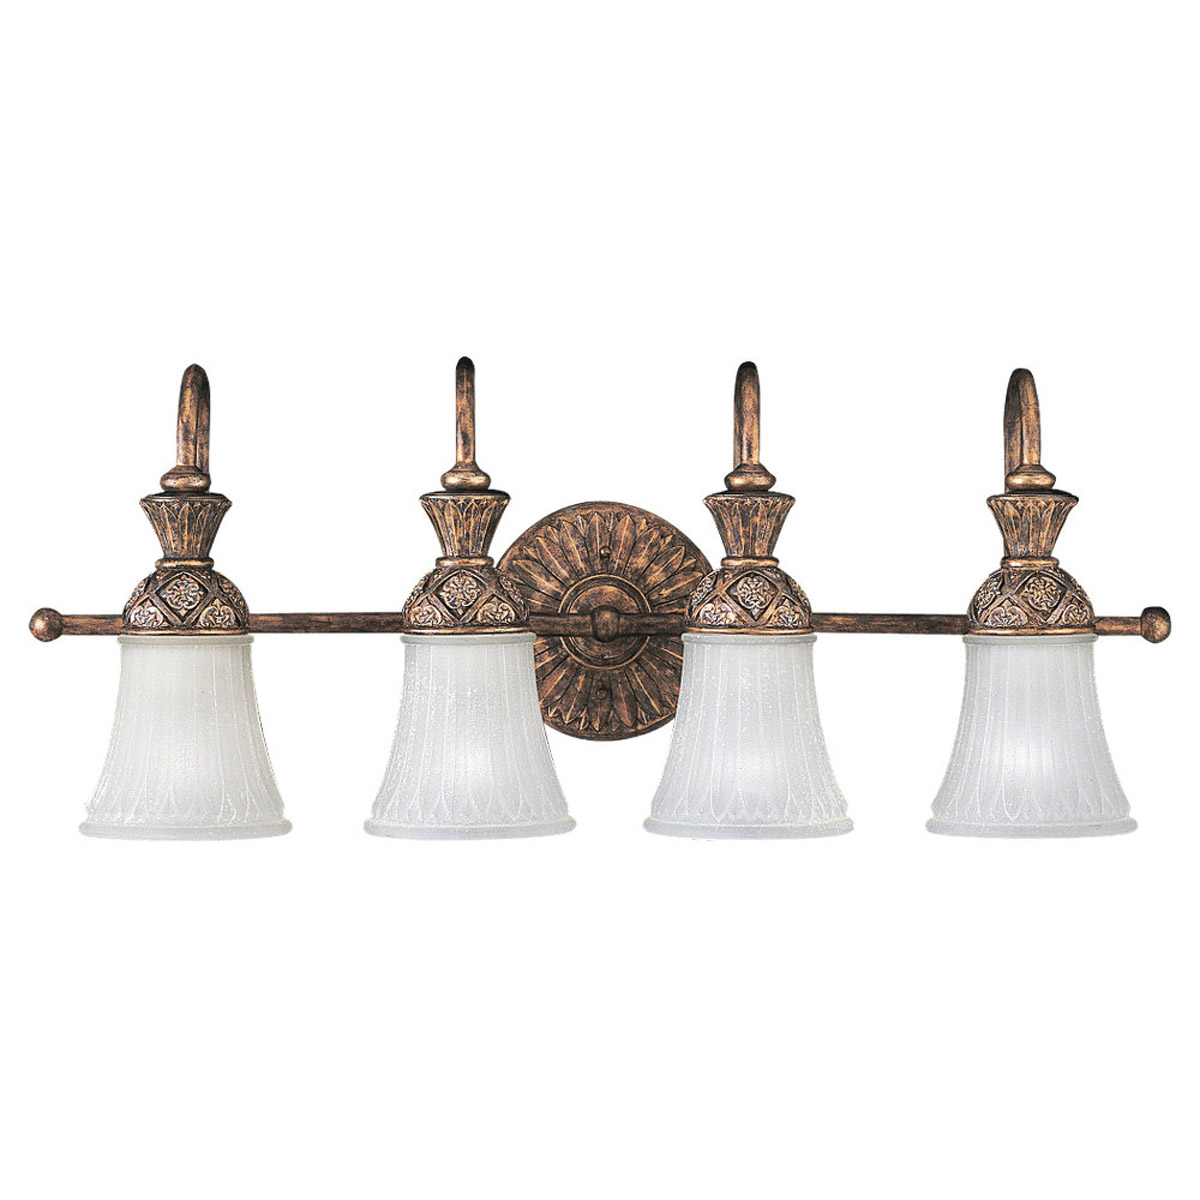 Sea Gull Lighting Highlands Light Bath Vanity In Regal Bronze - Seagull bathroom lighting